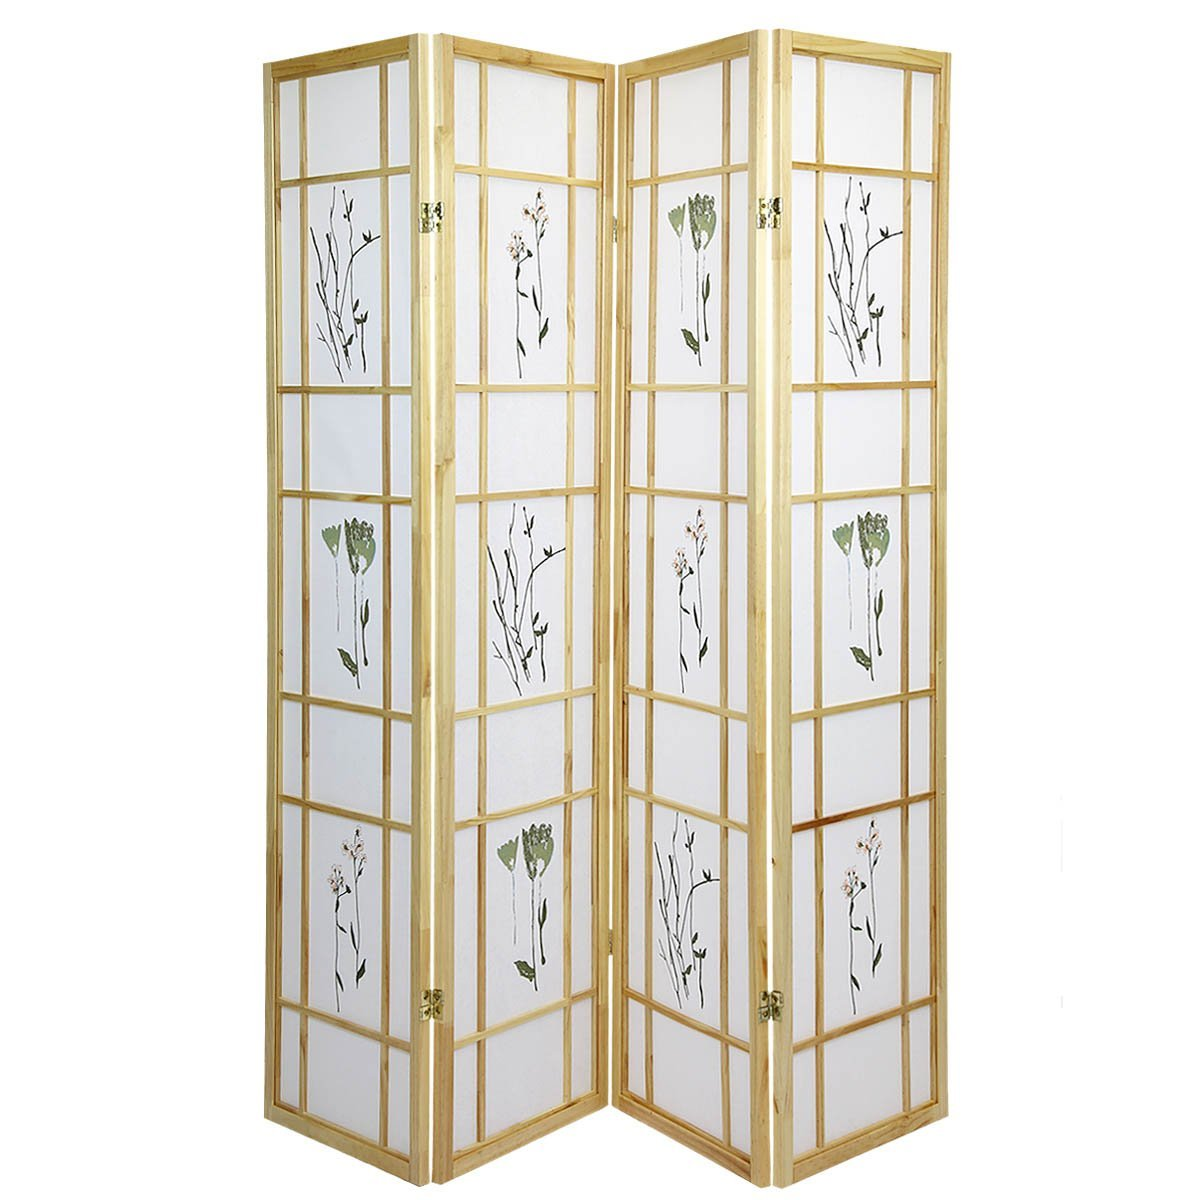 High Quality Oriental Room Divider Hardwood Shoji Screen ...